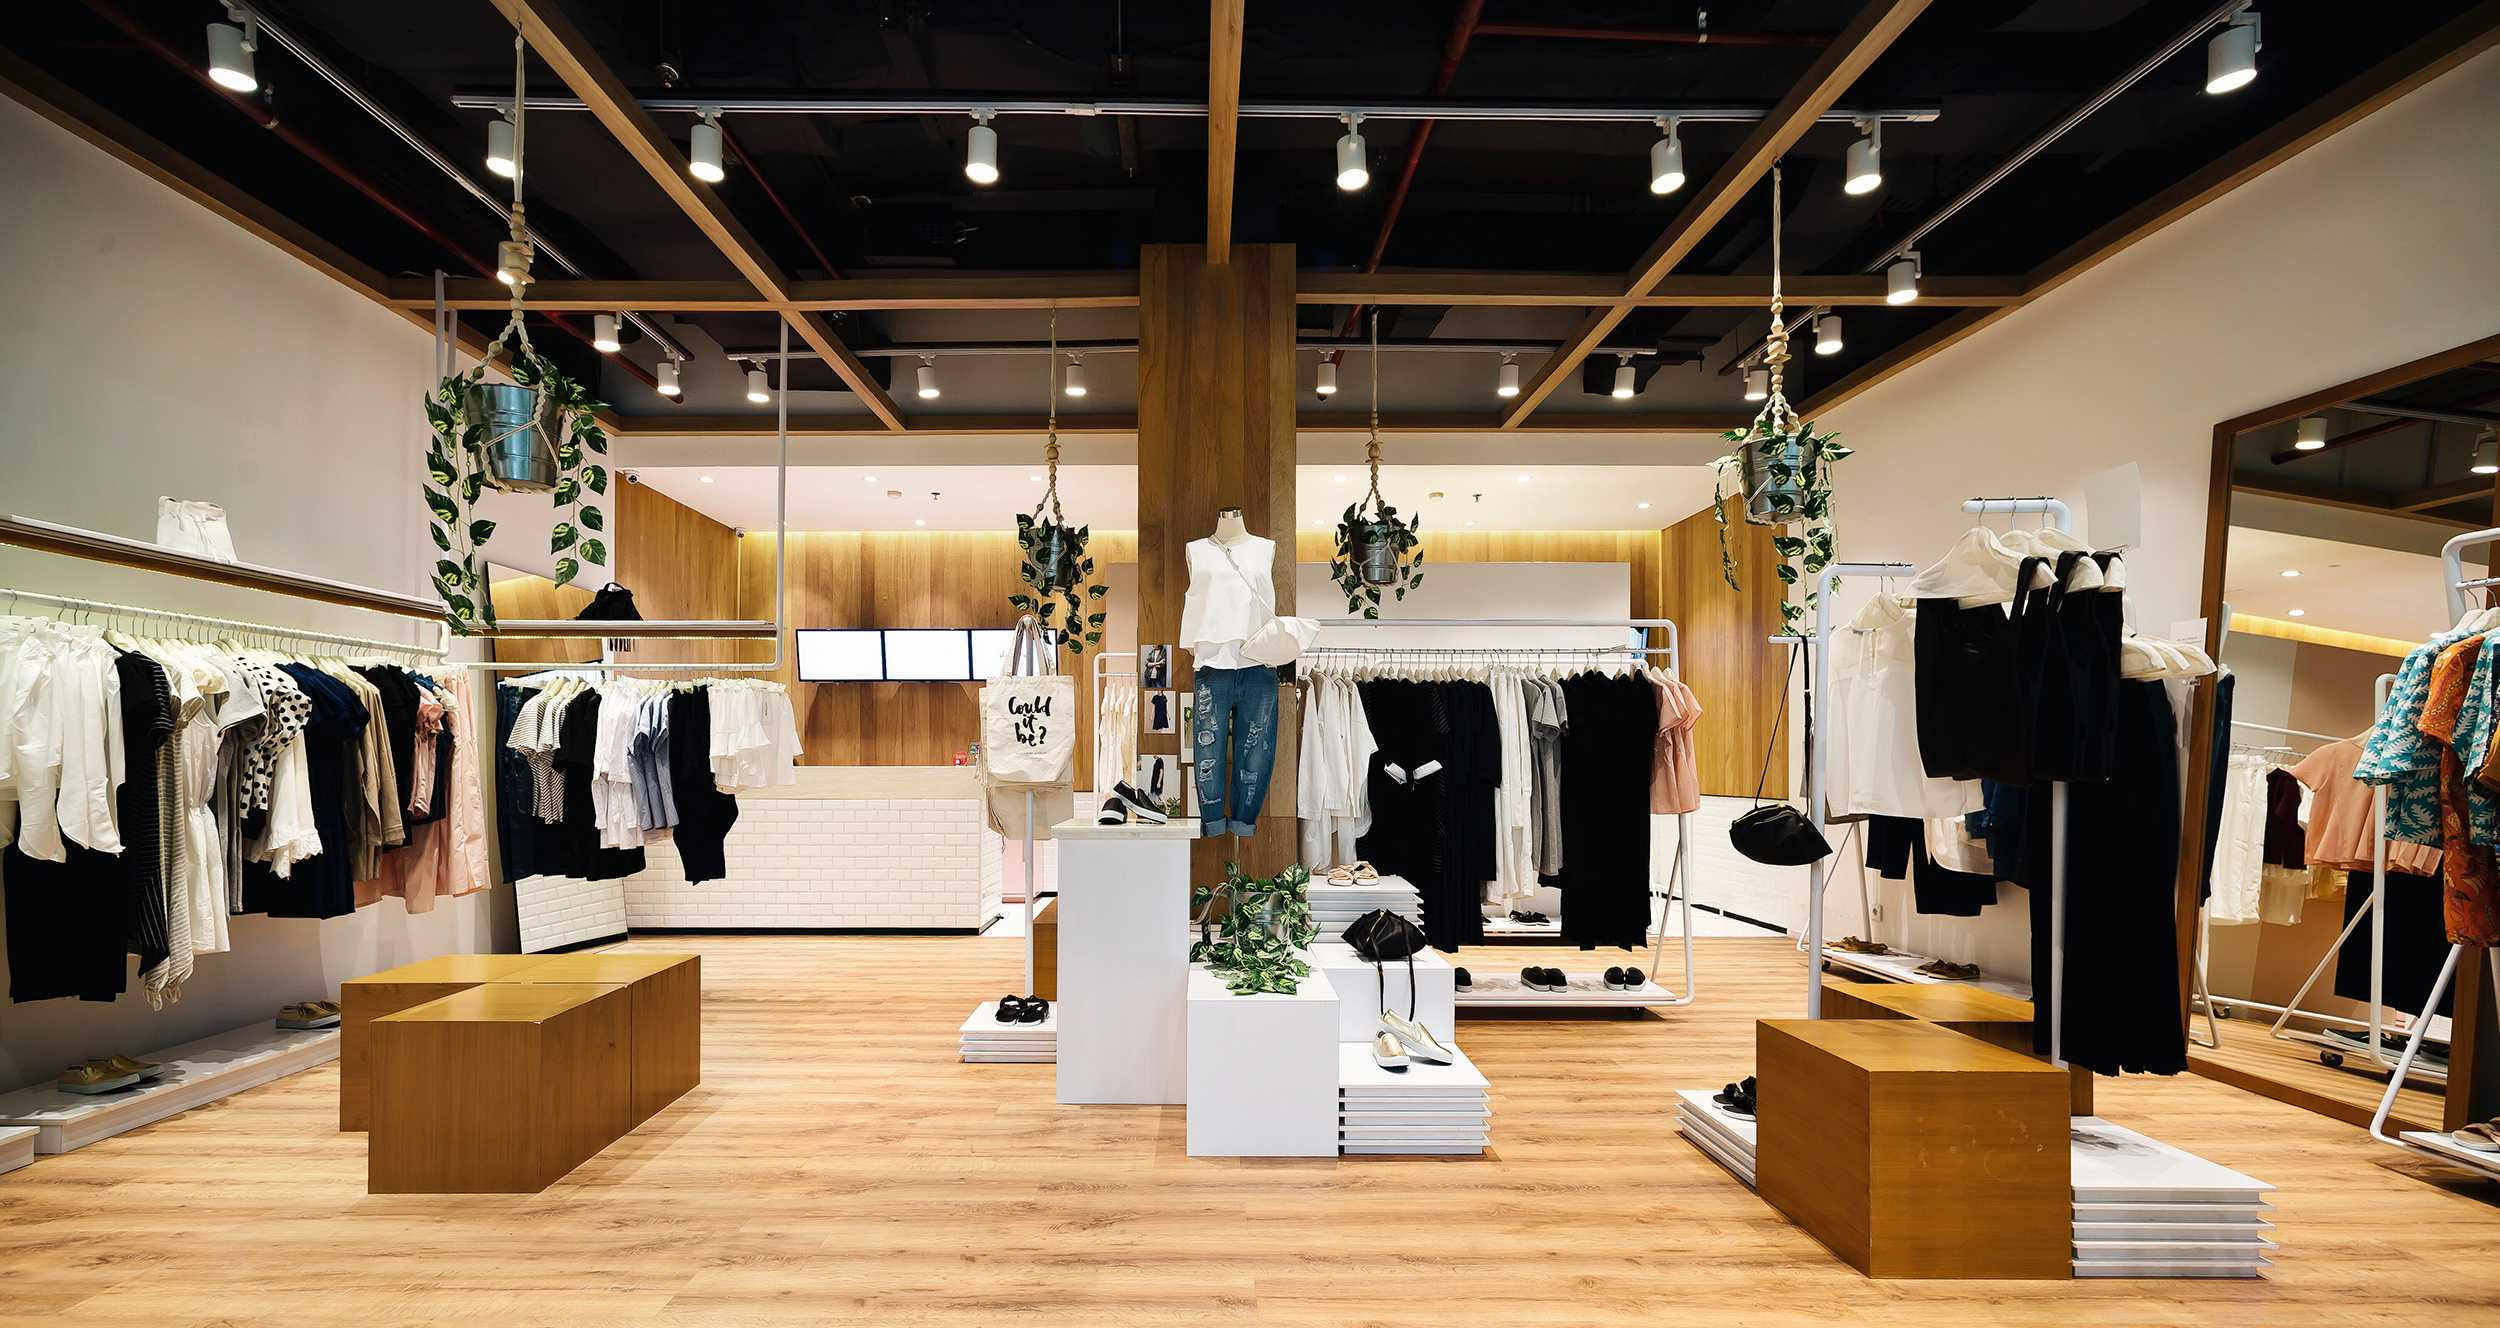 Tp architects cottonink store jakarta indonesia plaza senayan interior kontemporerwoodmodern 9601